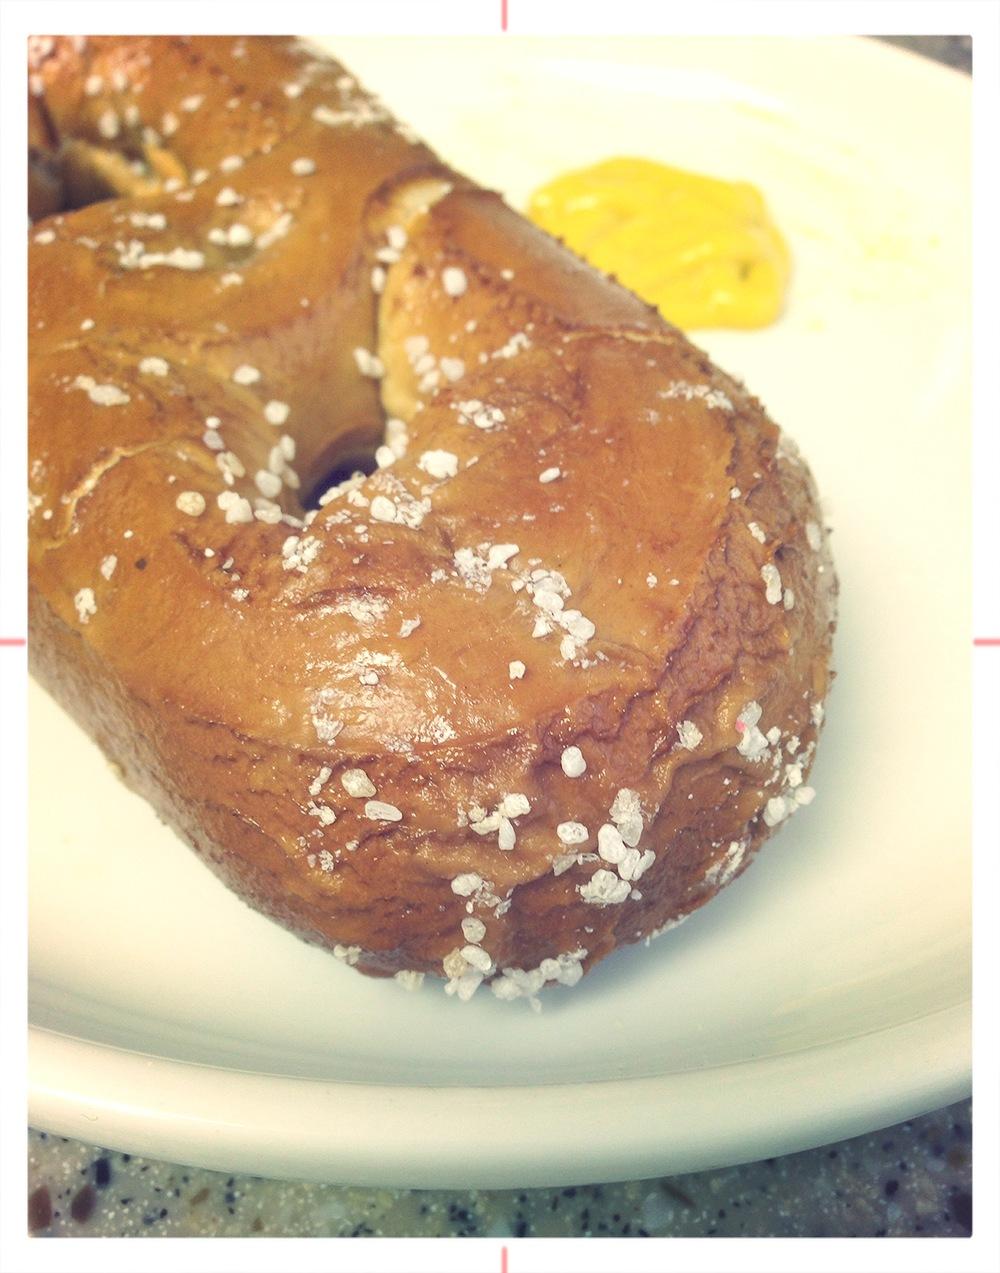 Philly pretzel